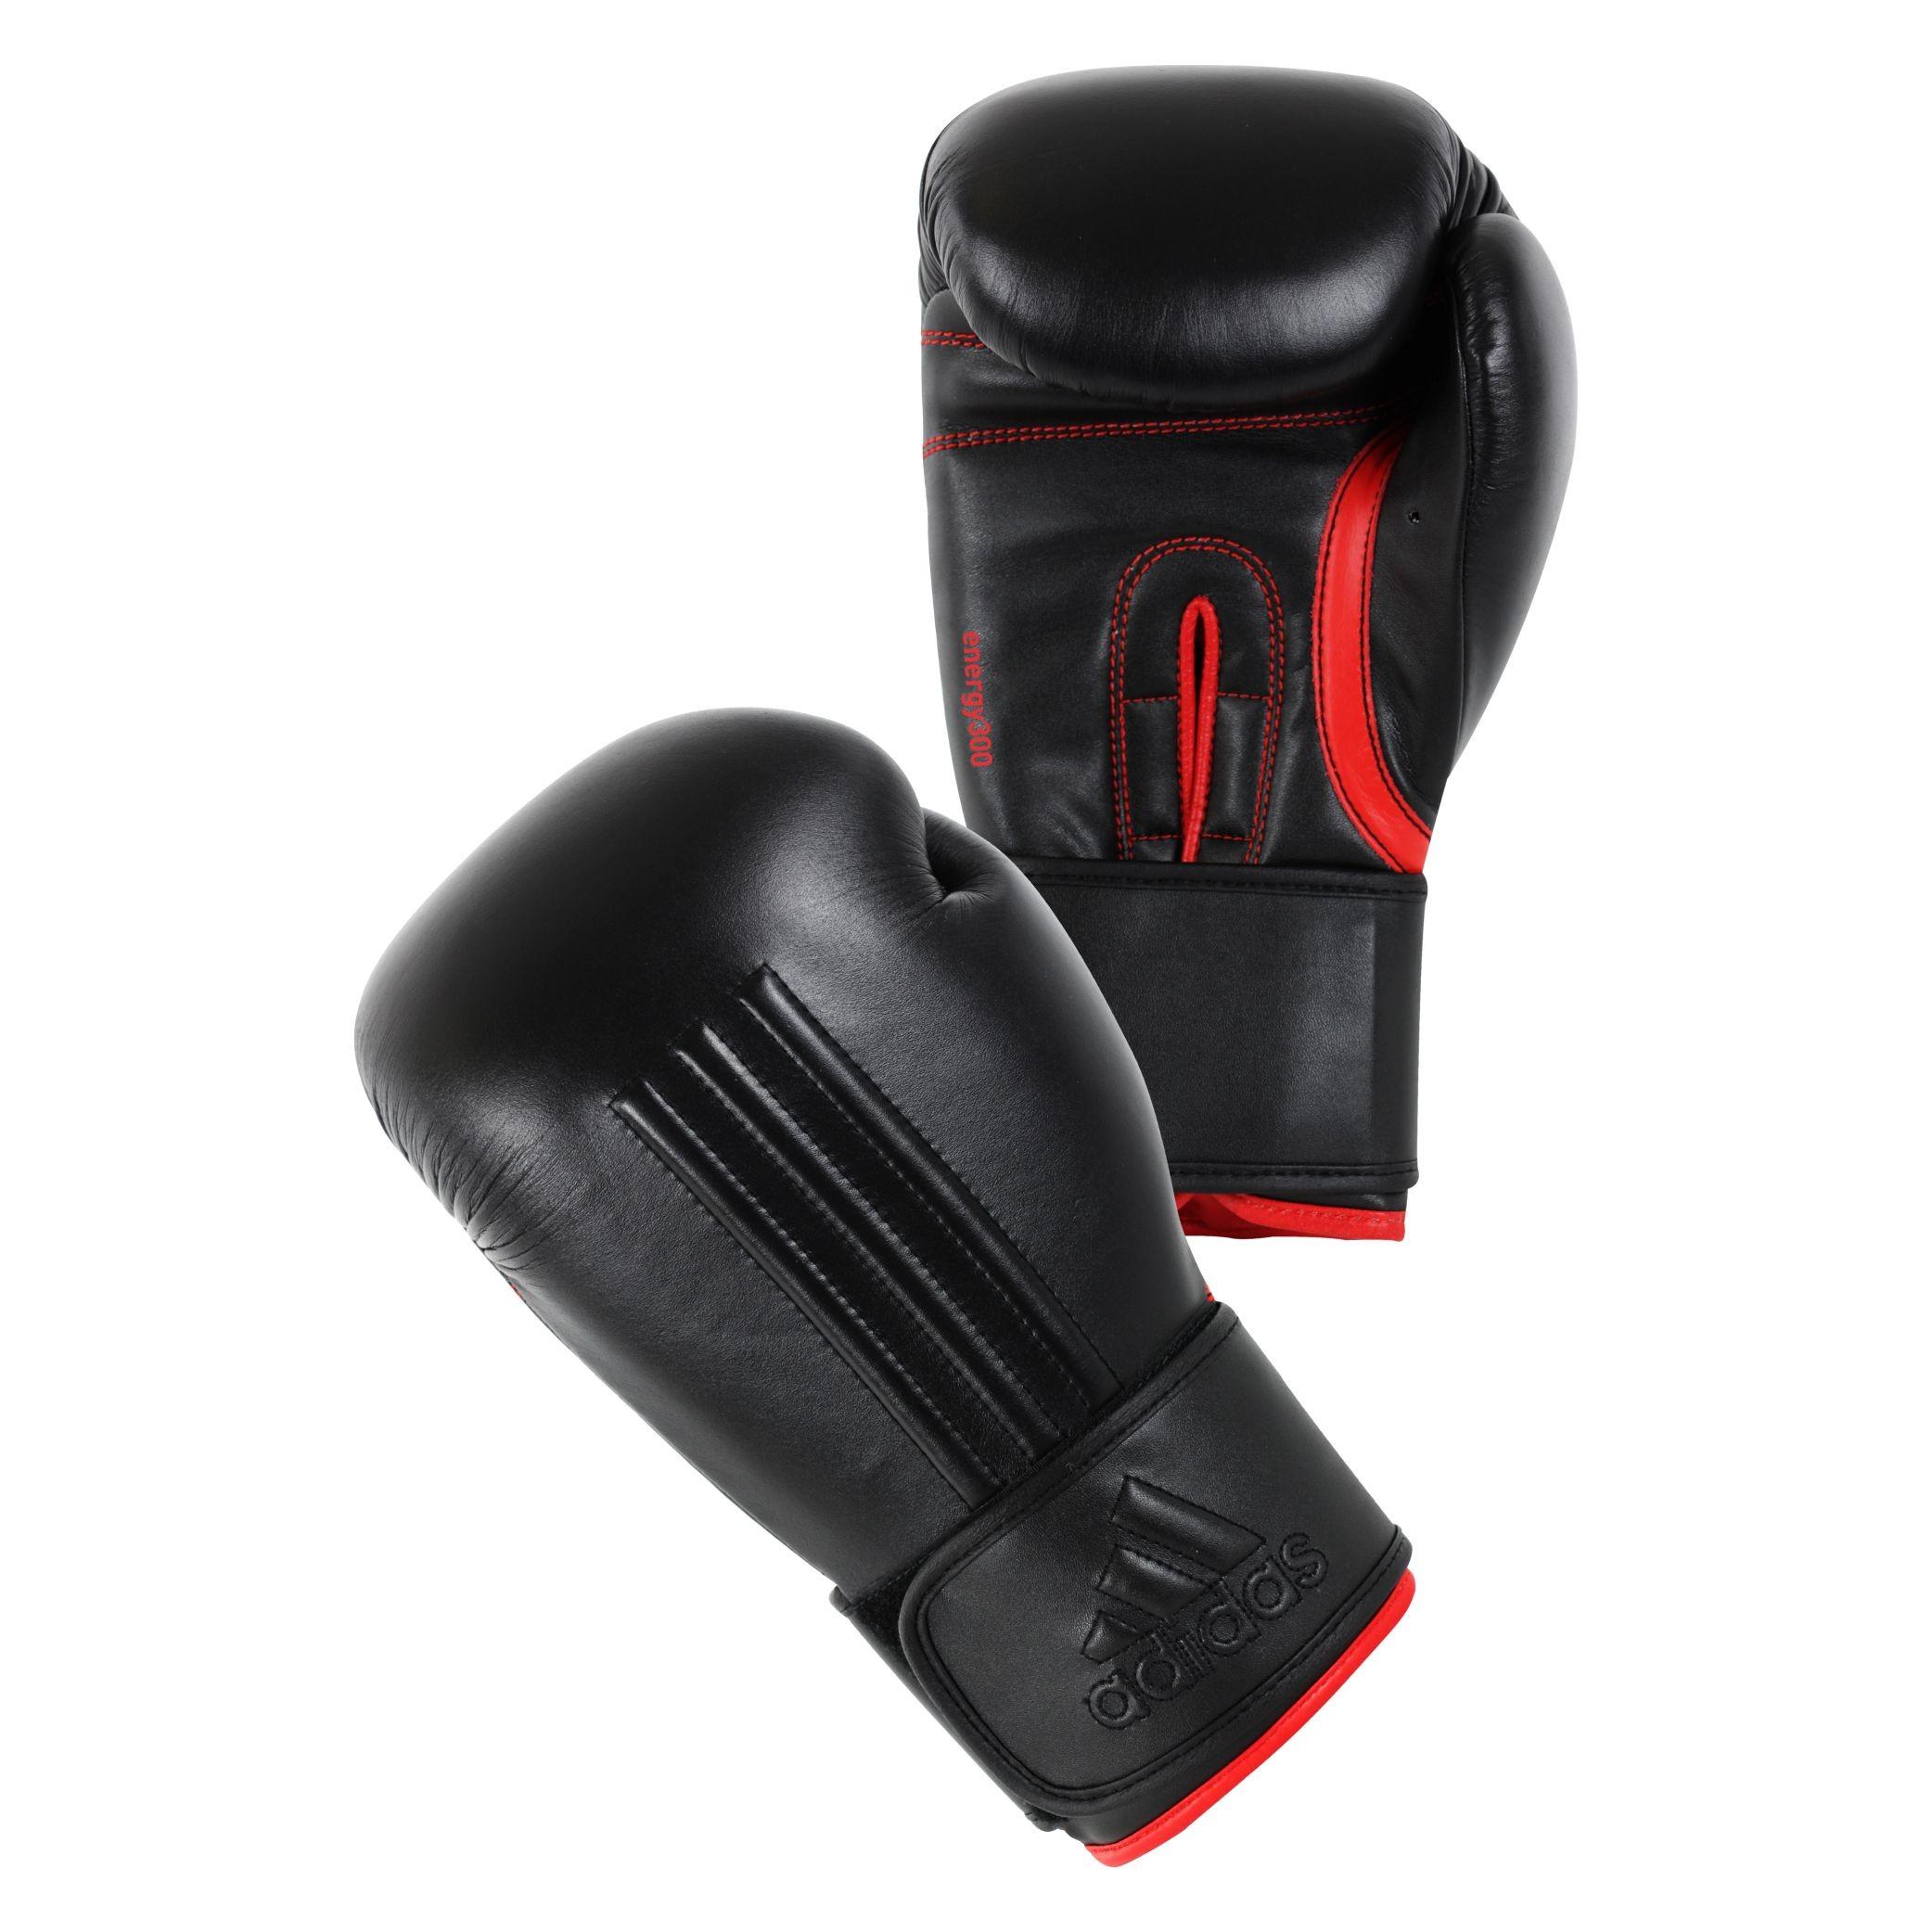 Adidas Boxhandschuh Energy 300